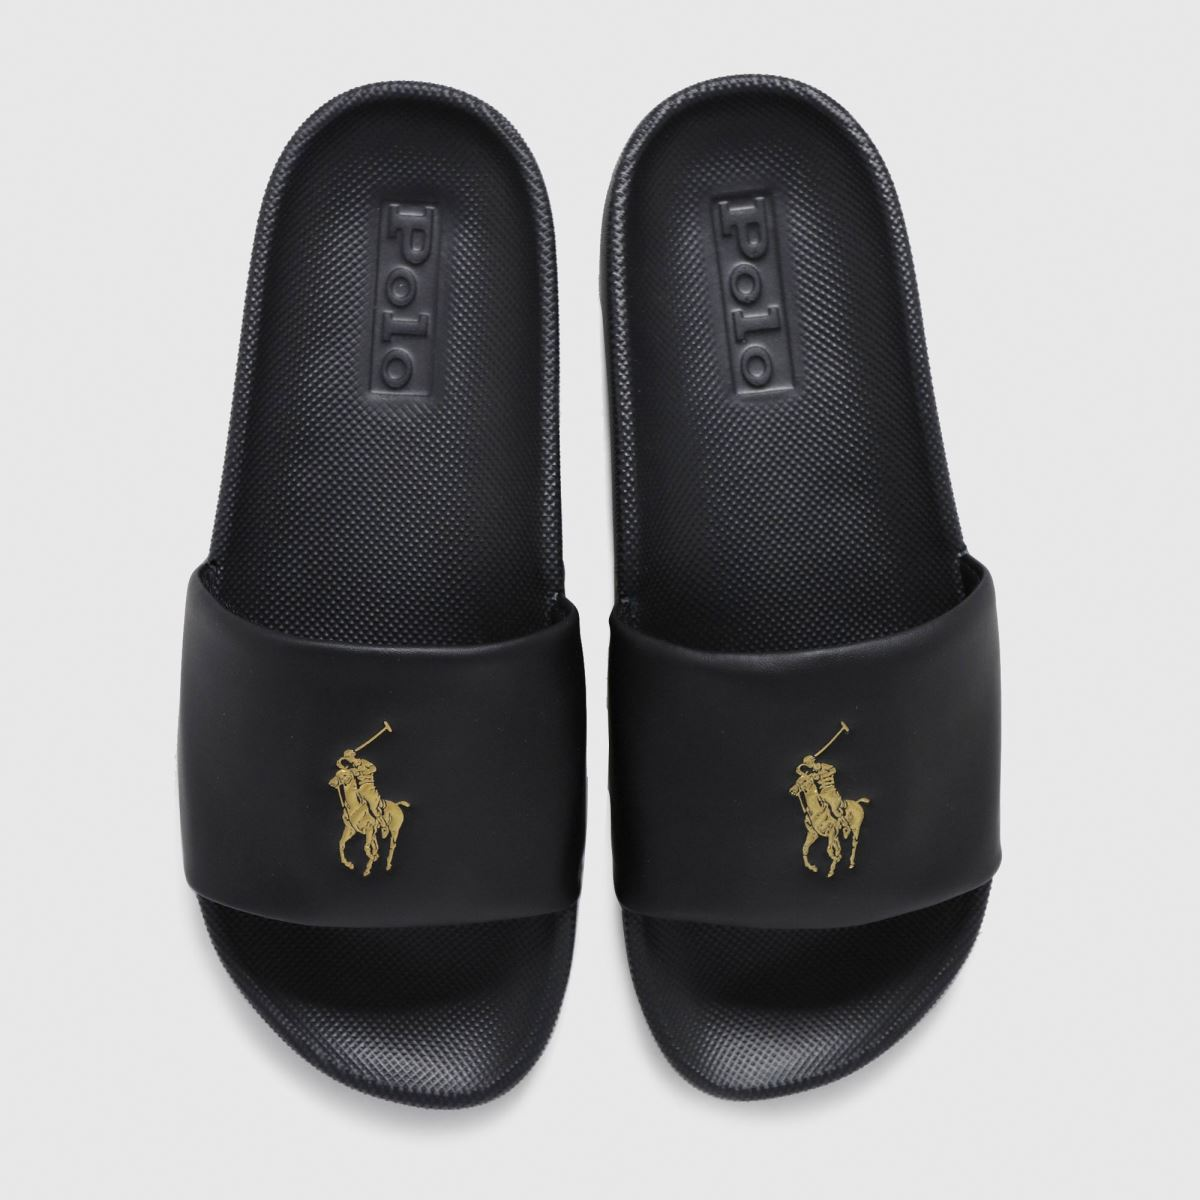 LAUREN RALPH LAUREN Black & Gold Cayson Slide Sandals